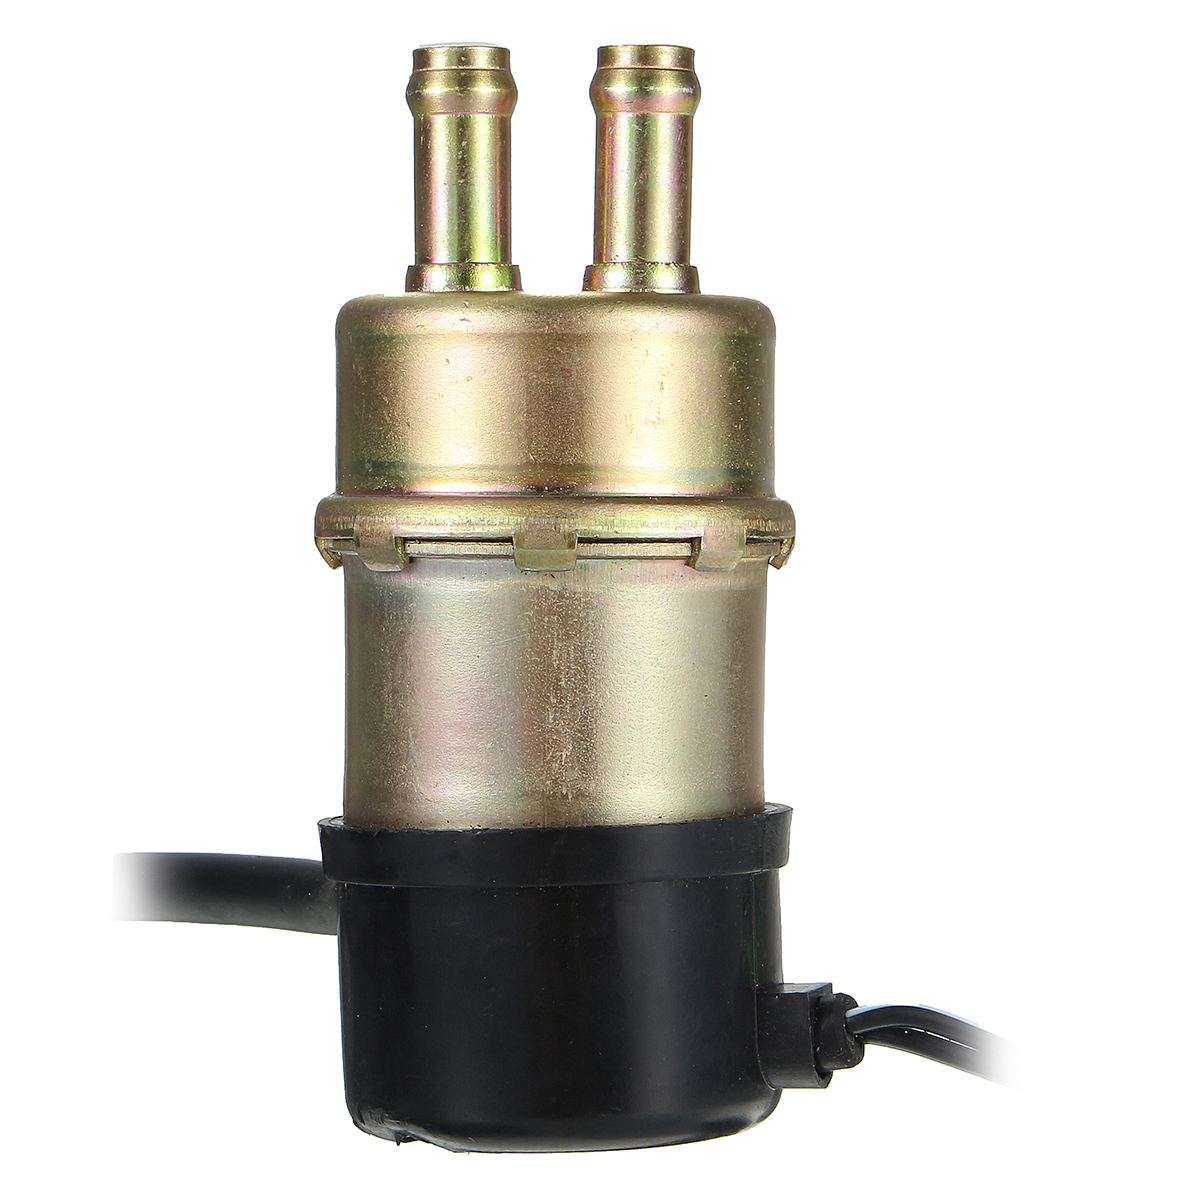 6 8 10mm fuel pump filter for kawasaki mule 3000 3010 2500 2510 [ 1200 x 1200 Pixel ]